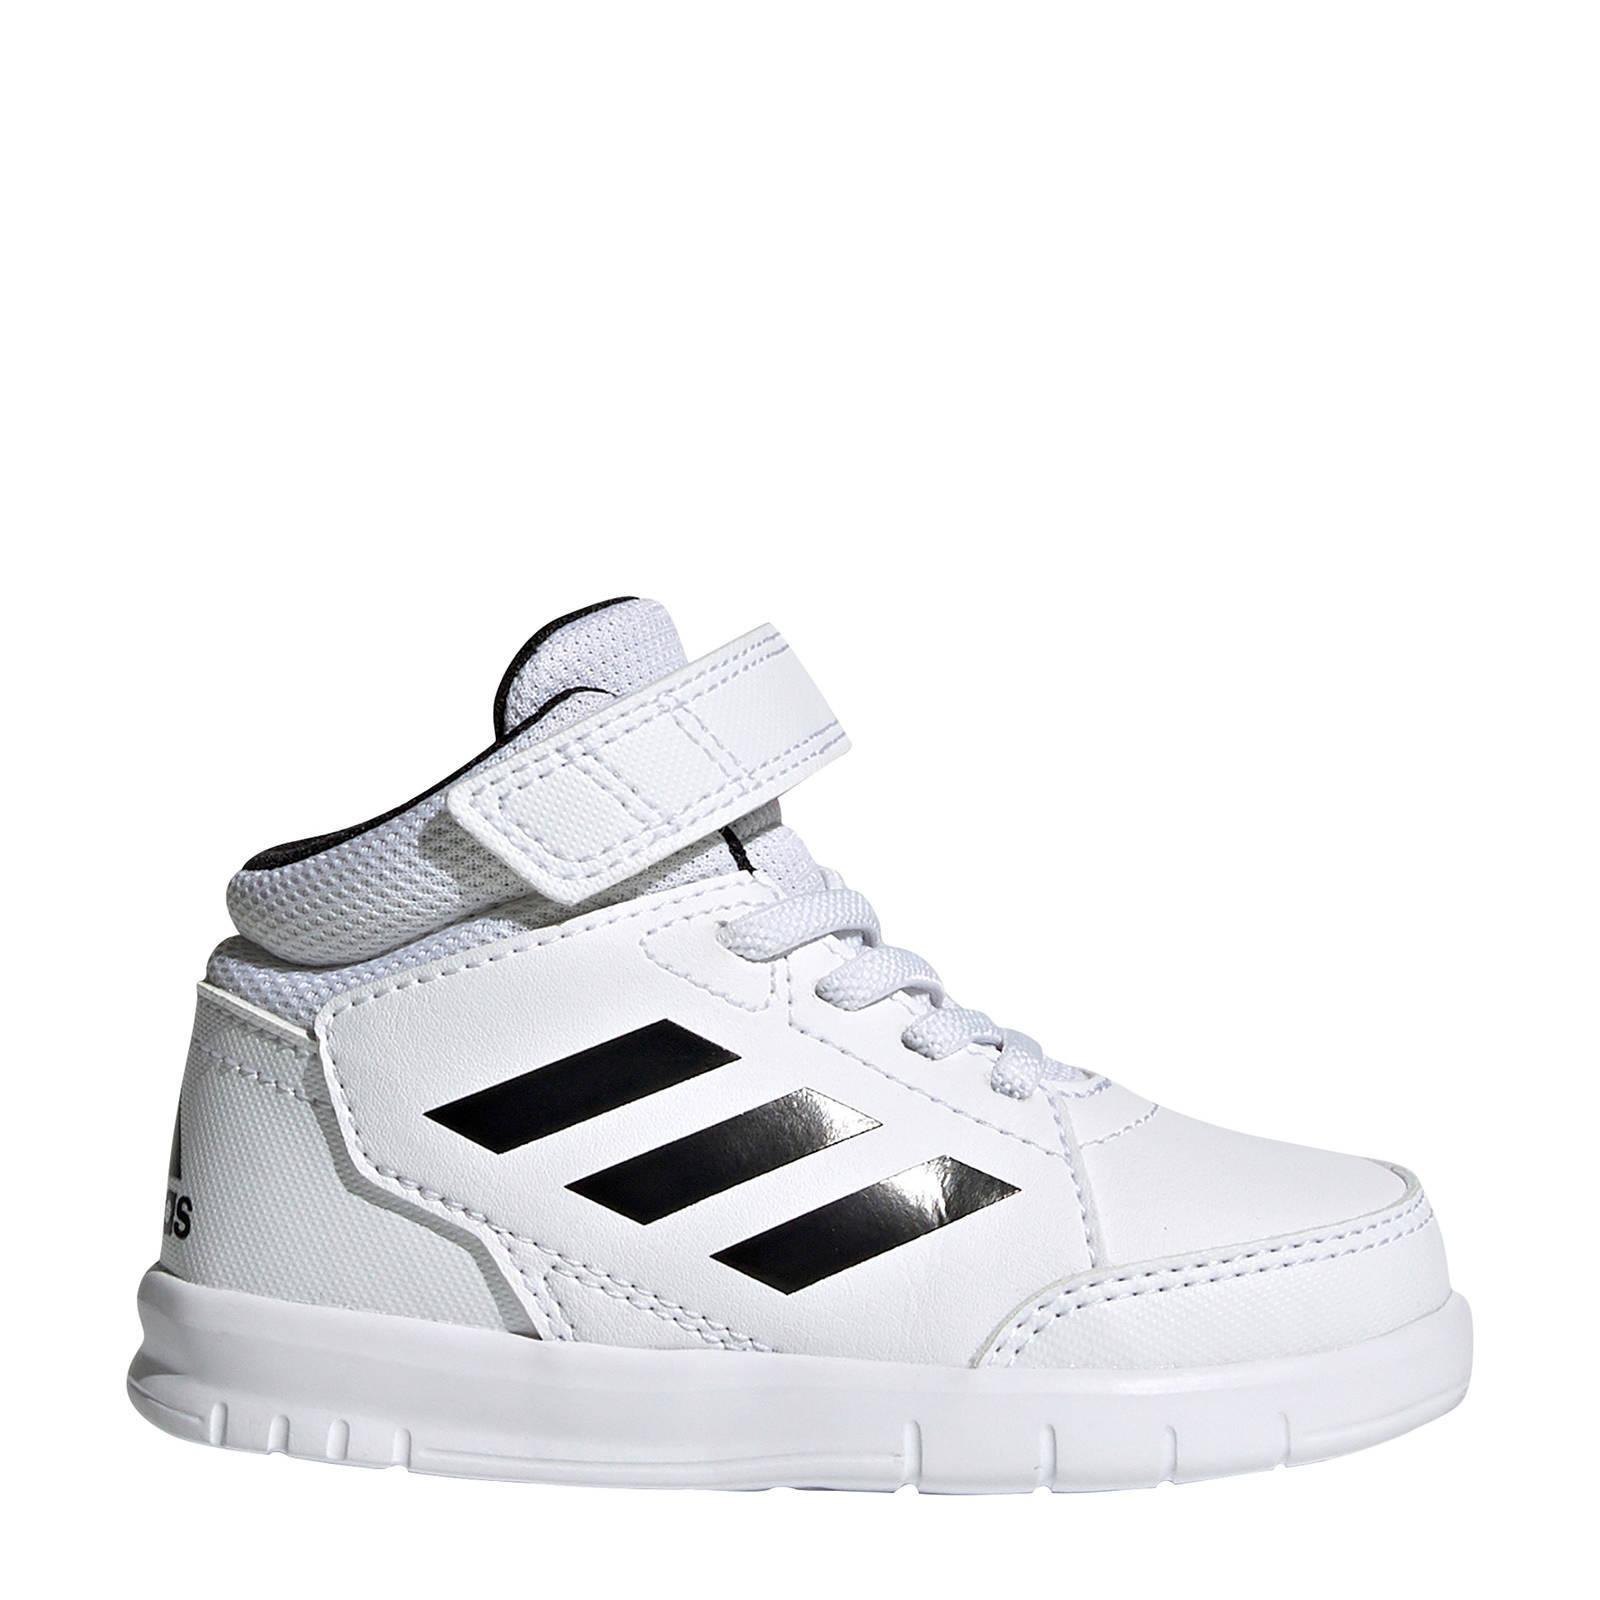 adidas AltaSport Mid I AltaSport Mid I sportschoenen wit